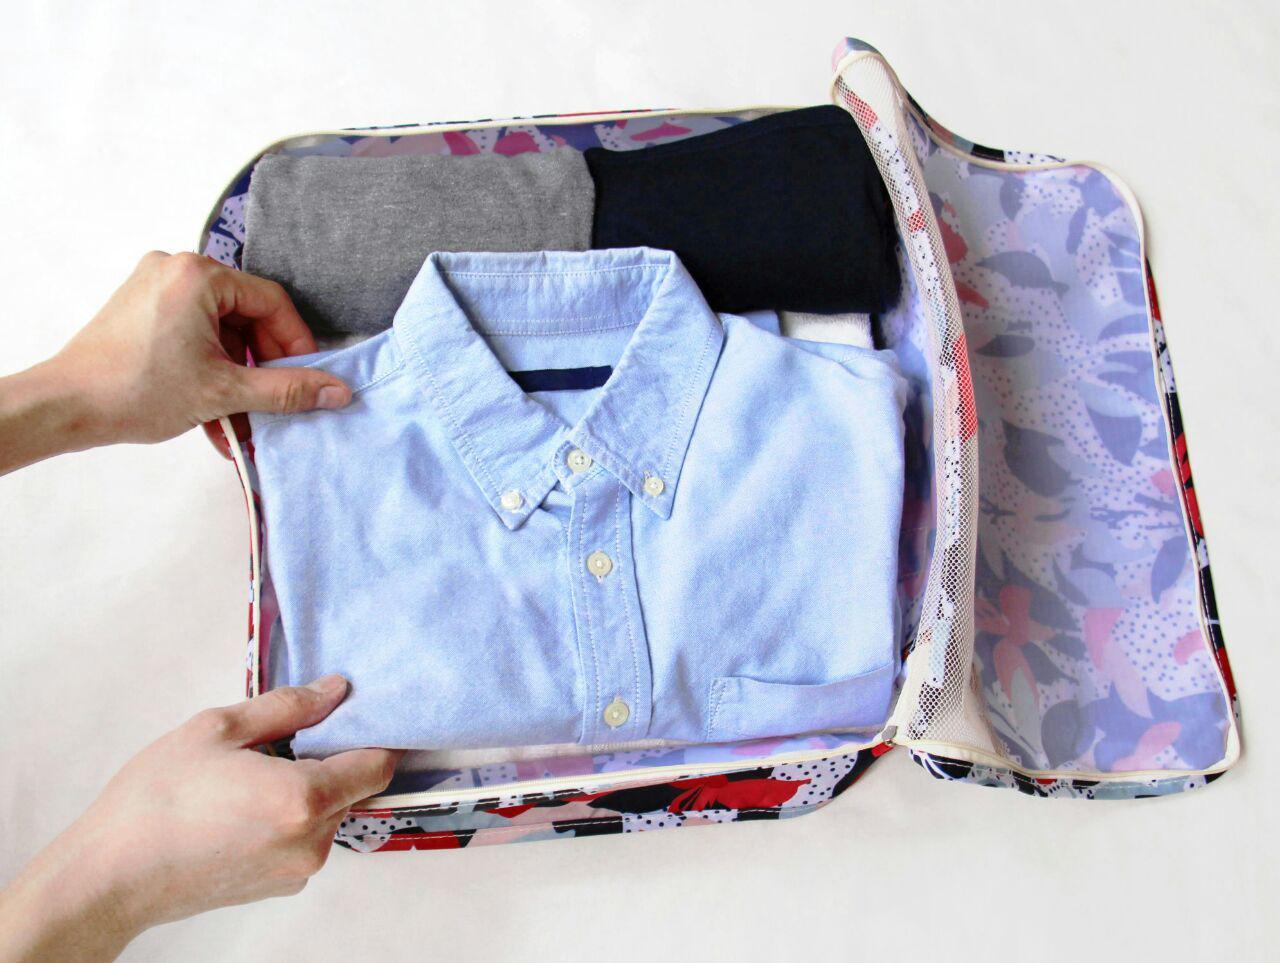 Artisan Luggage Organizer (8pc set), luggage organisers, travel organizers organizer clothes, travel packing, travel organization folding vs rolling clothes style degree singapore sg